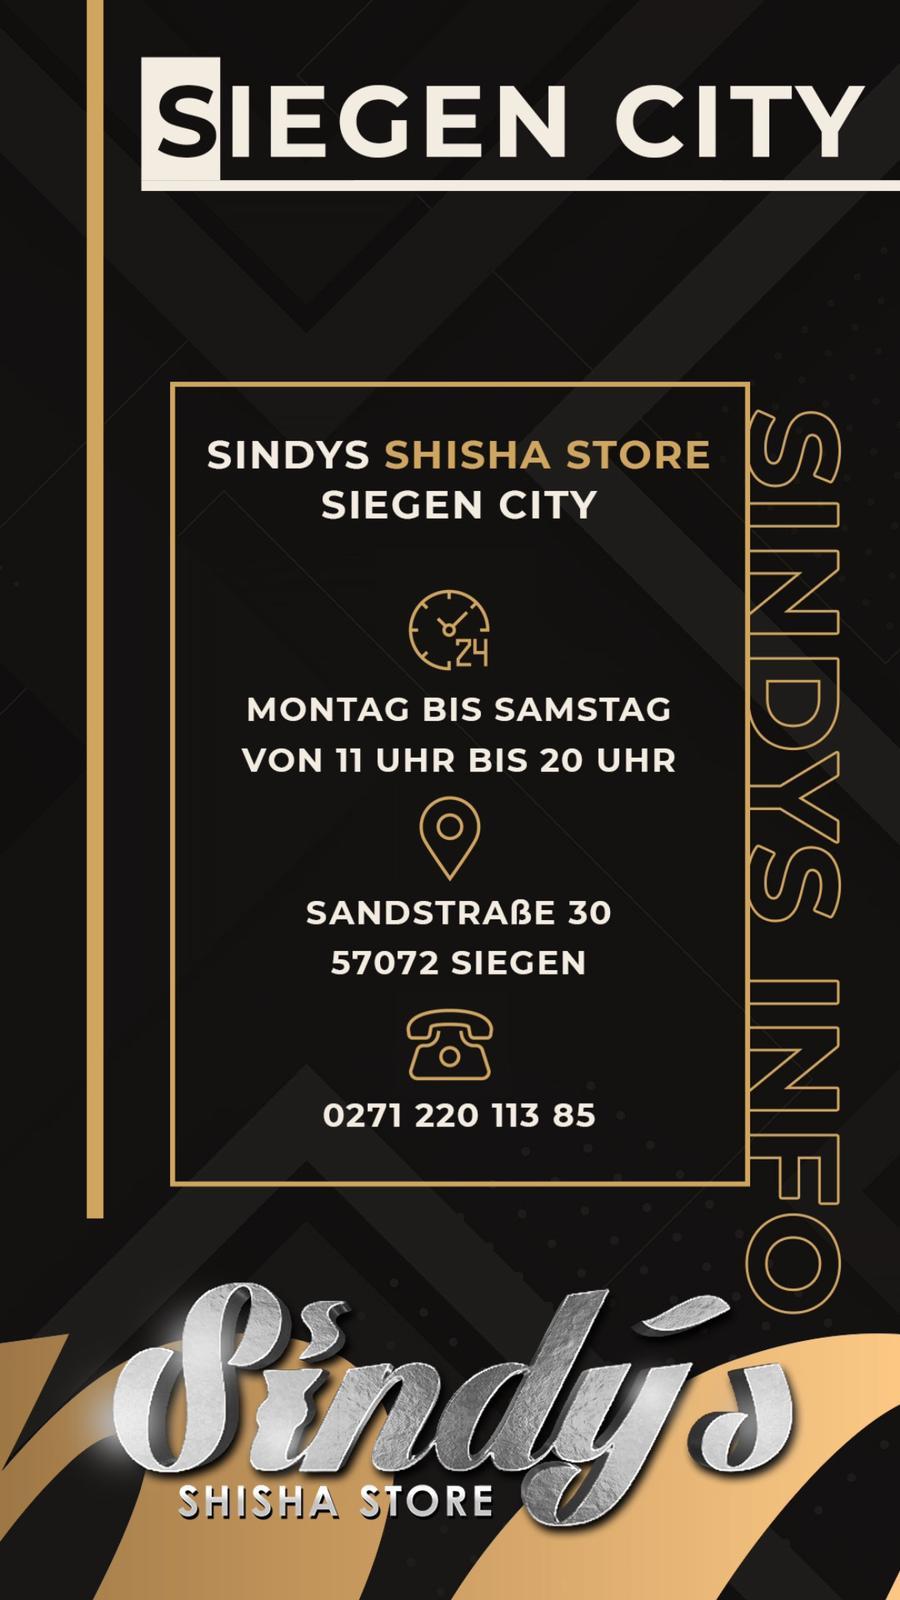 Sindys Shisha Store Siegen